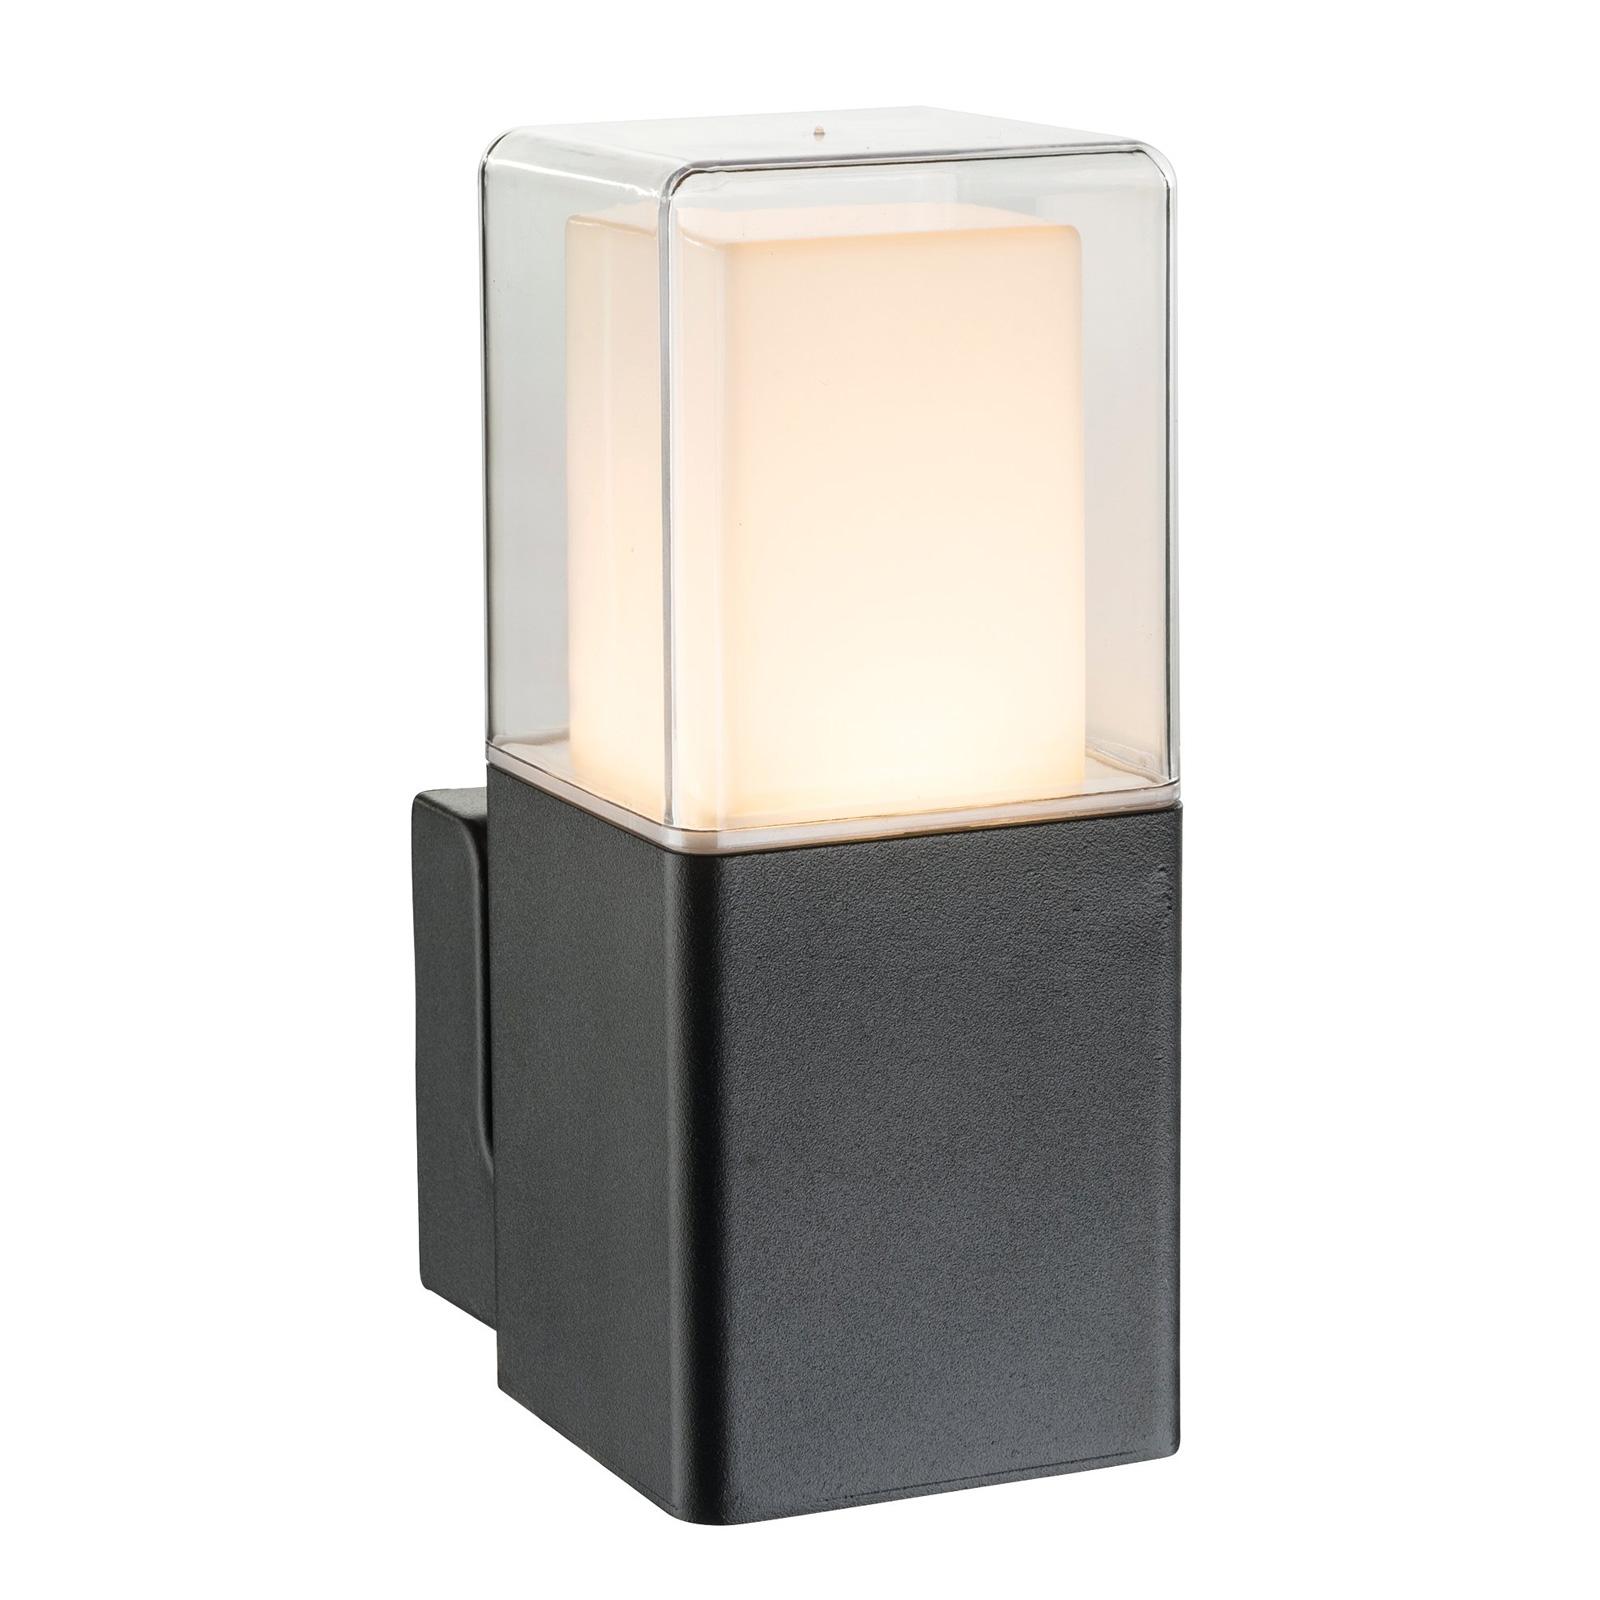 LED buitenwandlamp Dalia met glazen diffusor